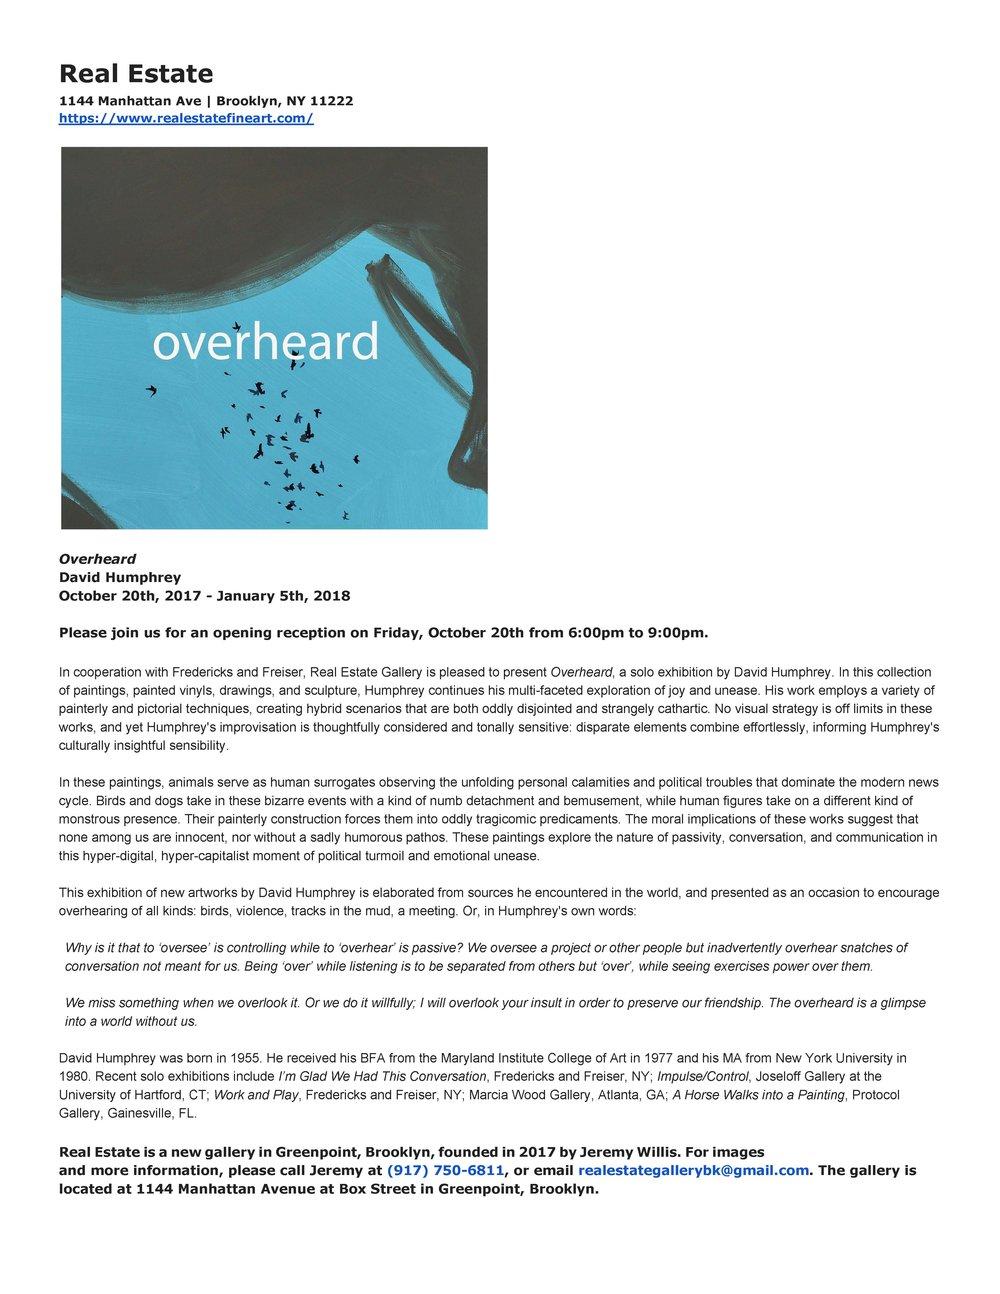 David Humphrey - Overheard - Press Release.jpg